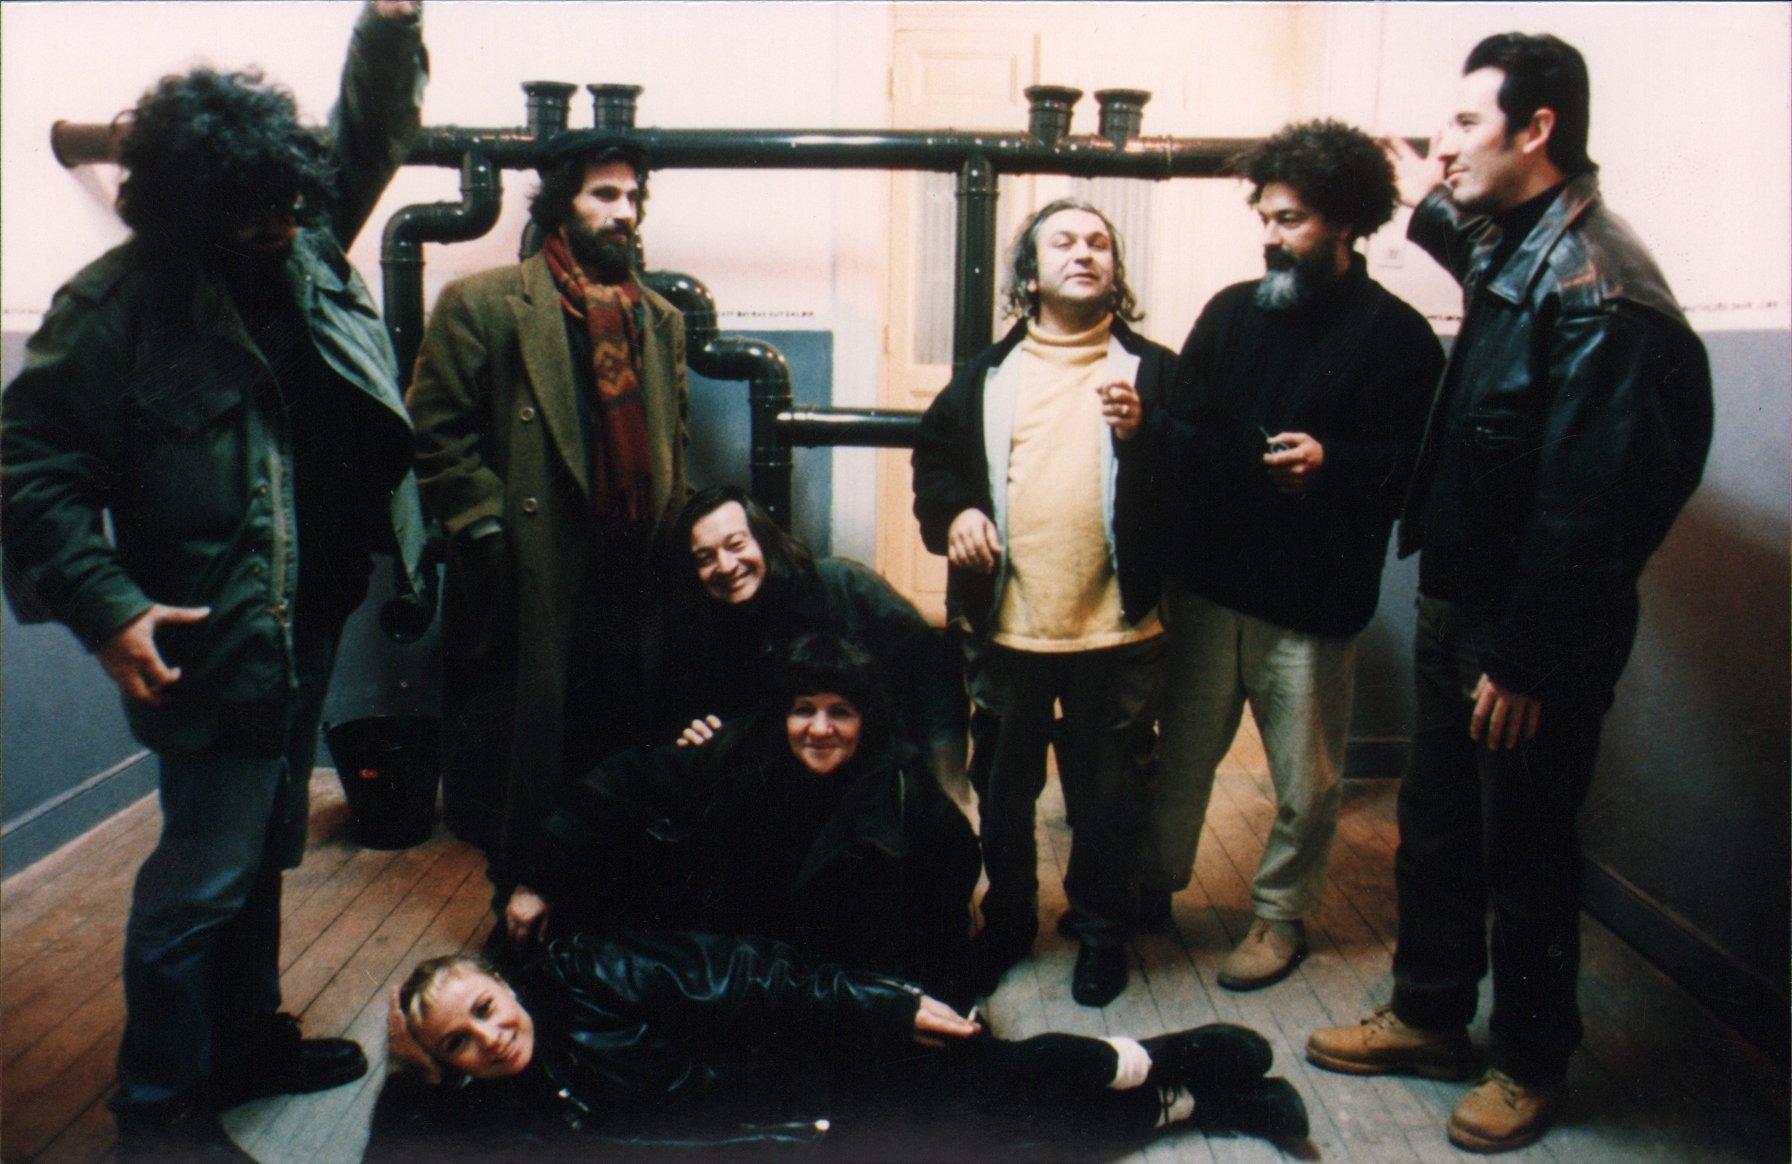 Pictured from left to right,  Ahmet Müderrisoğlu, Ismet Doğan, Hüseyin Bahri Alptekin, Emre Zeytinoğlu, Bülent Şangar and sitting Ali Akay, Gülsün Karamustafa and Müşerref Zeytinoğlu. (PHOTO COURTESY OF SALT Research)